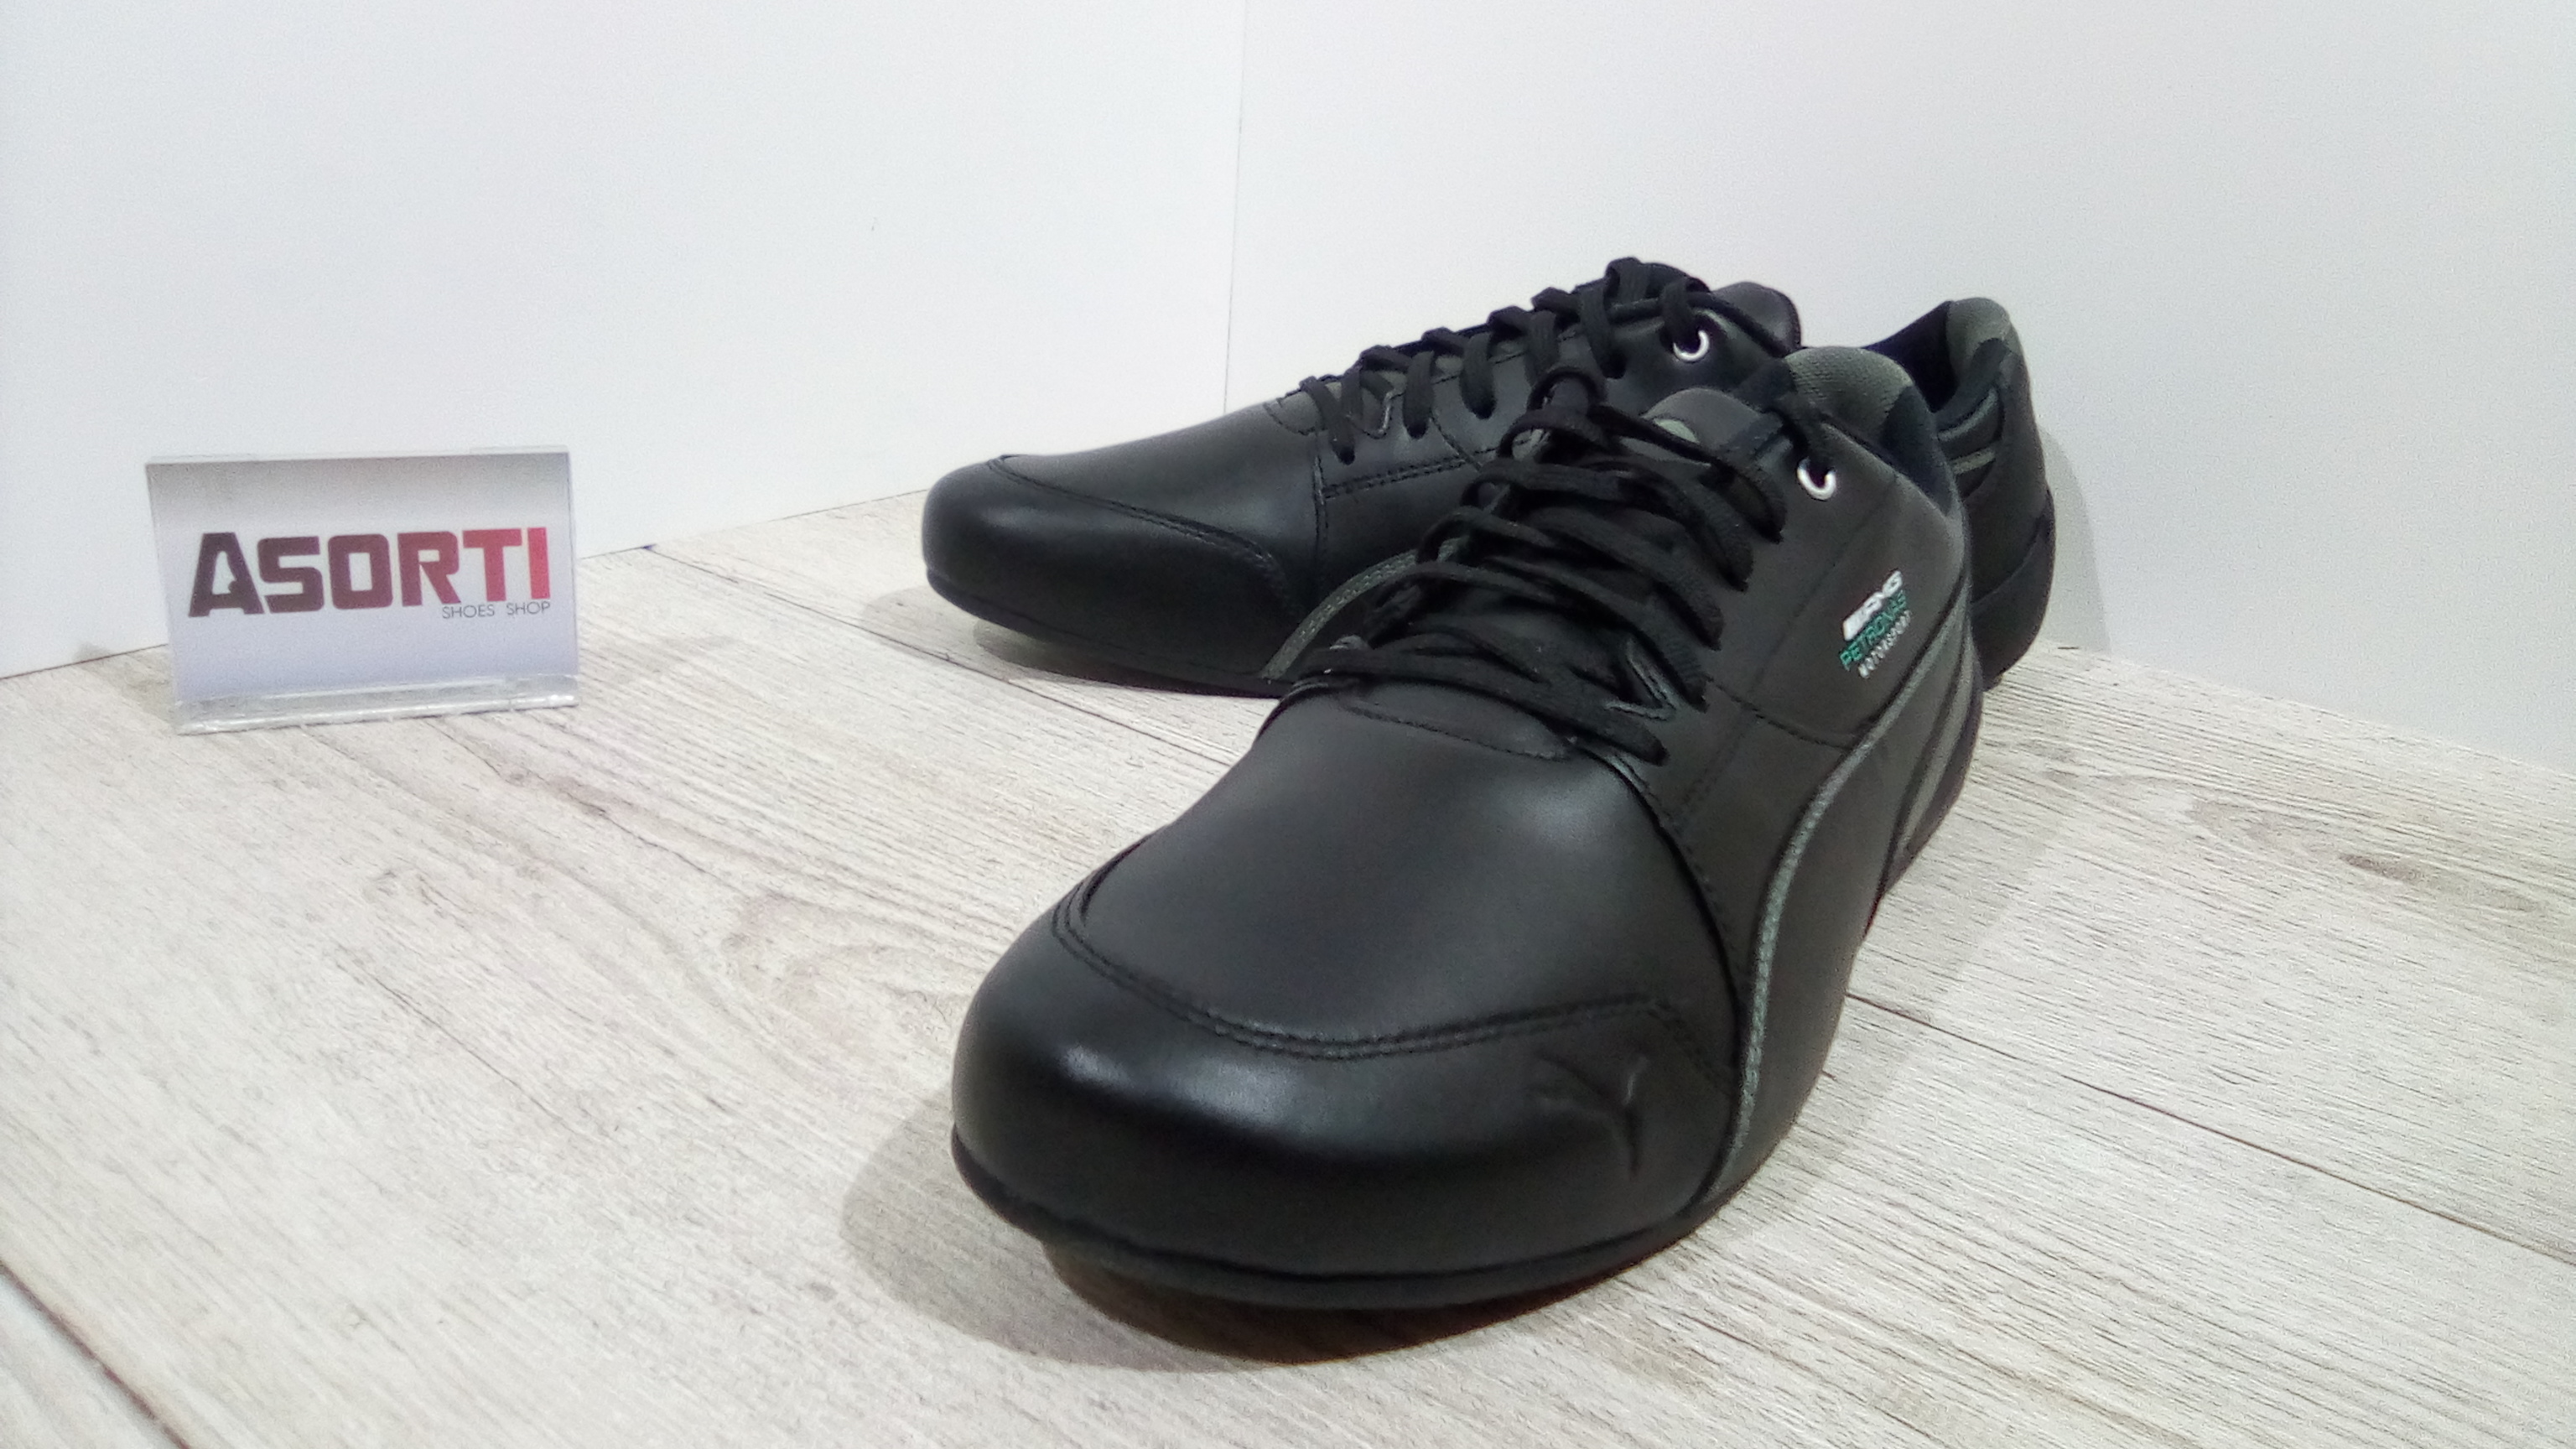 090ac154 ... Мужские кроссовки Puma Mercedes Motorsport Drift Cat 7 (306150-02)  черные ...